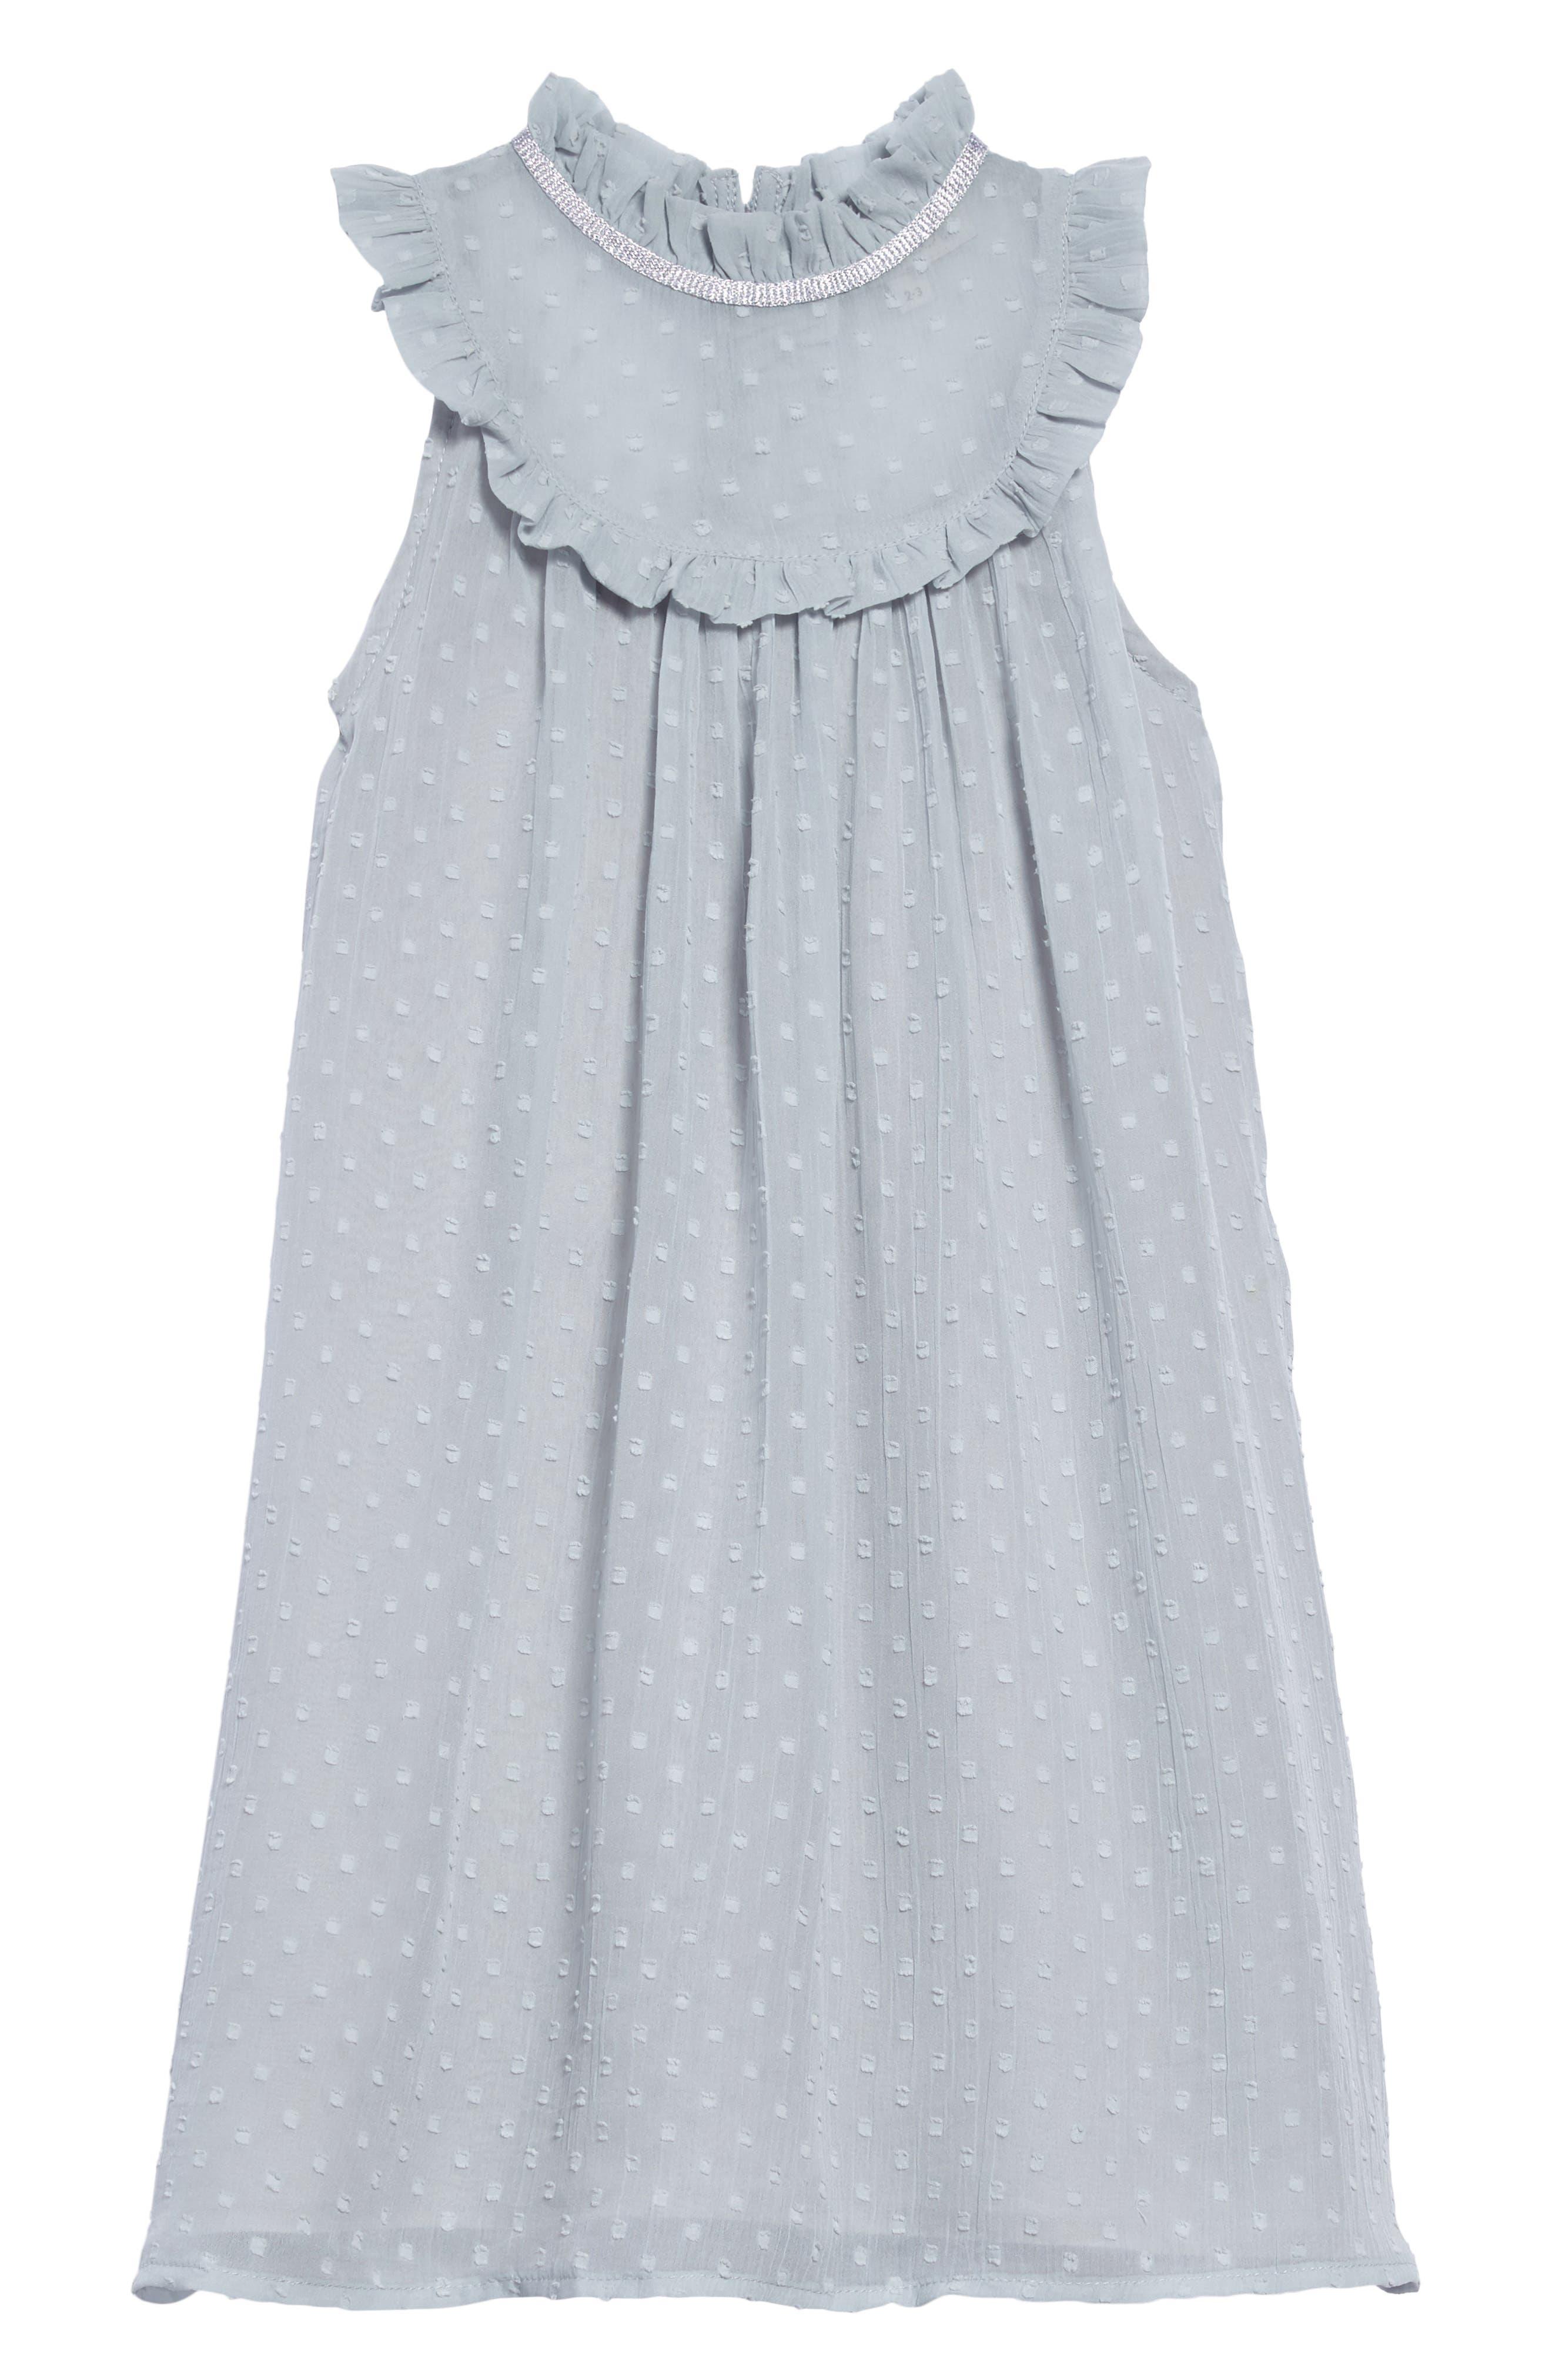 Wild & Gorgeous July Crush Dress (Toddler Girls, Little Girls & Big Girls)